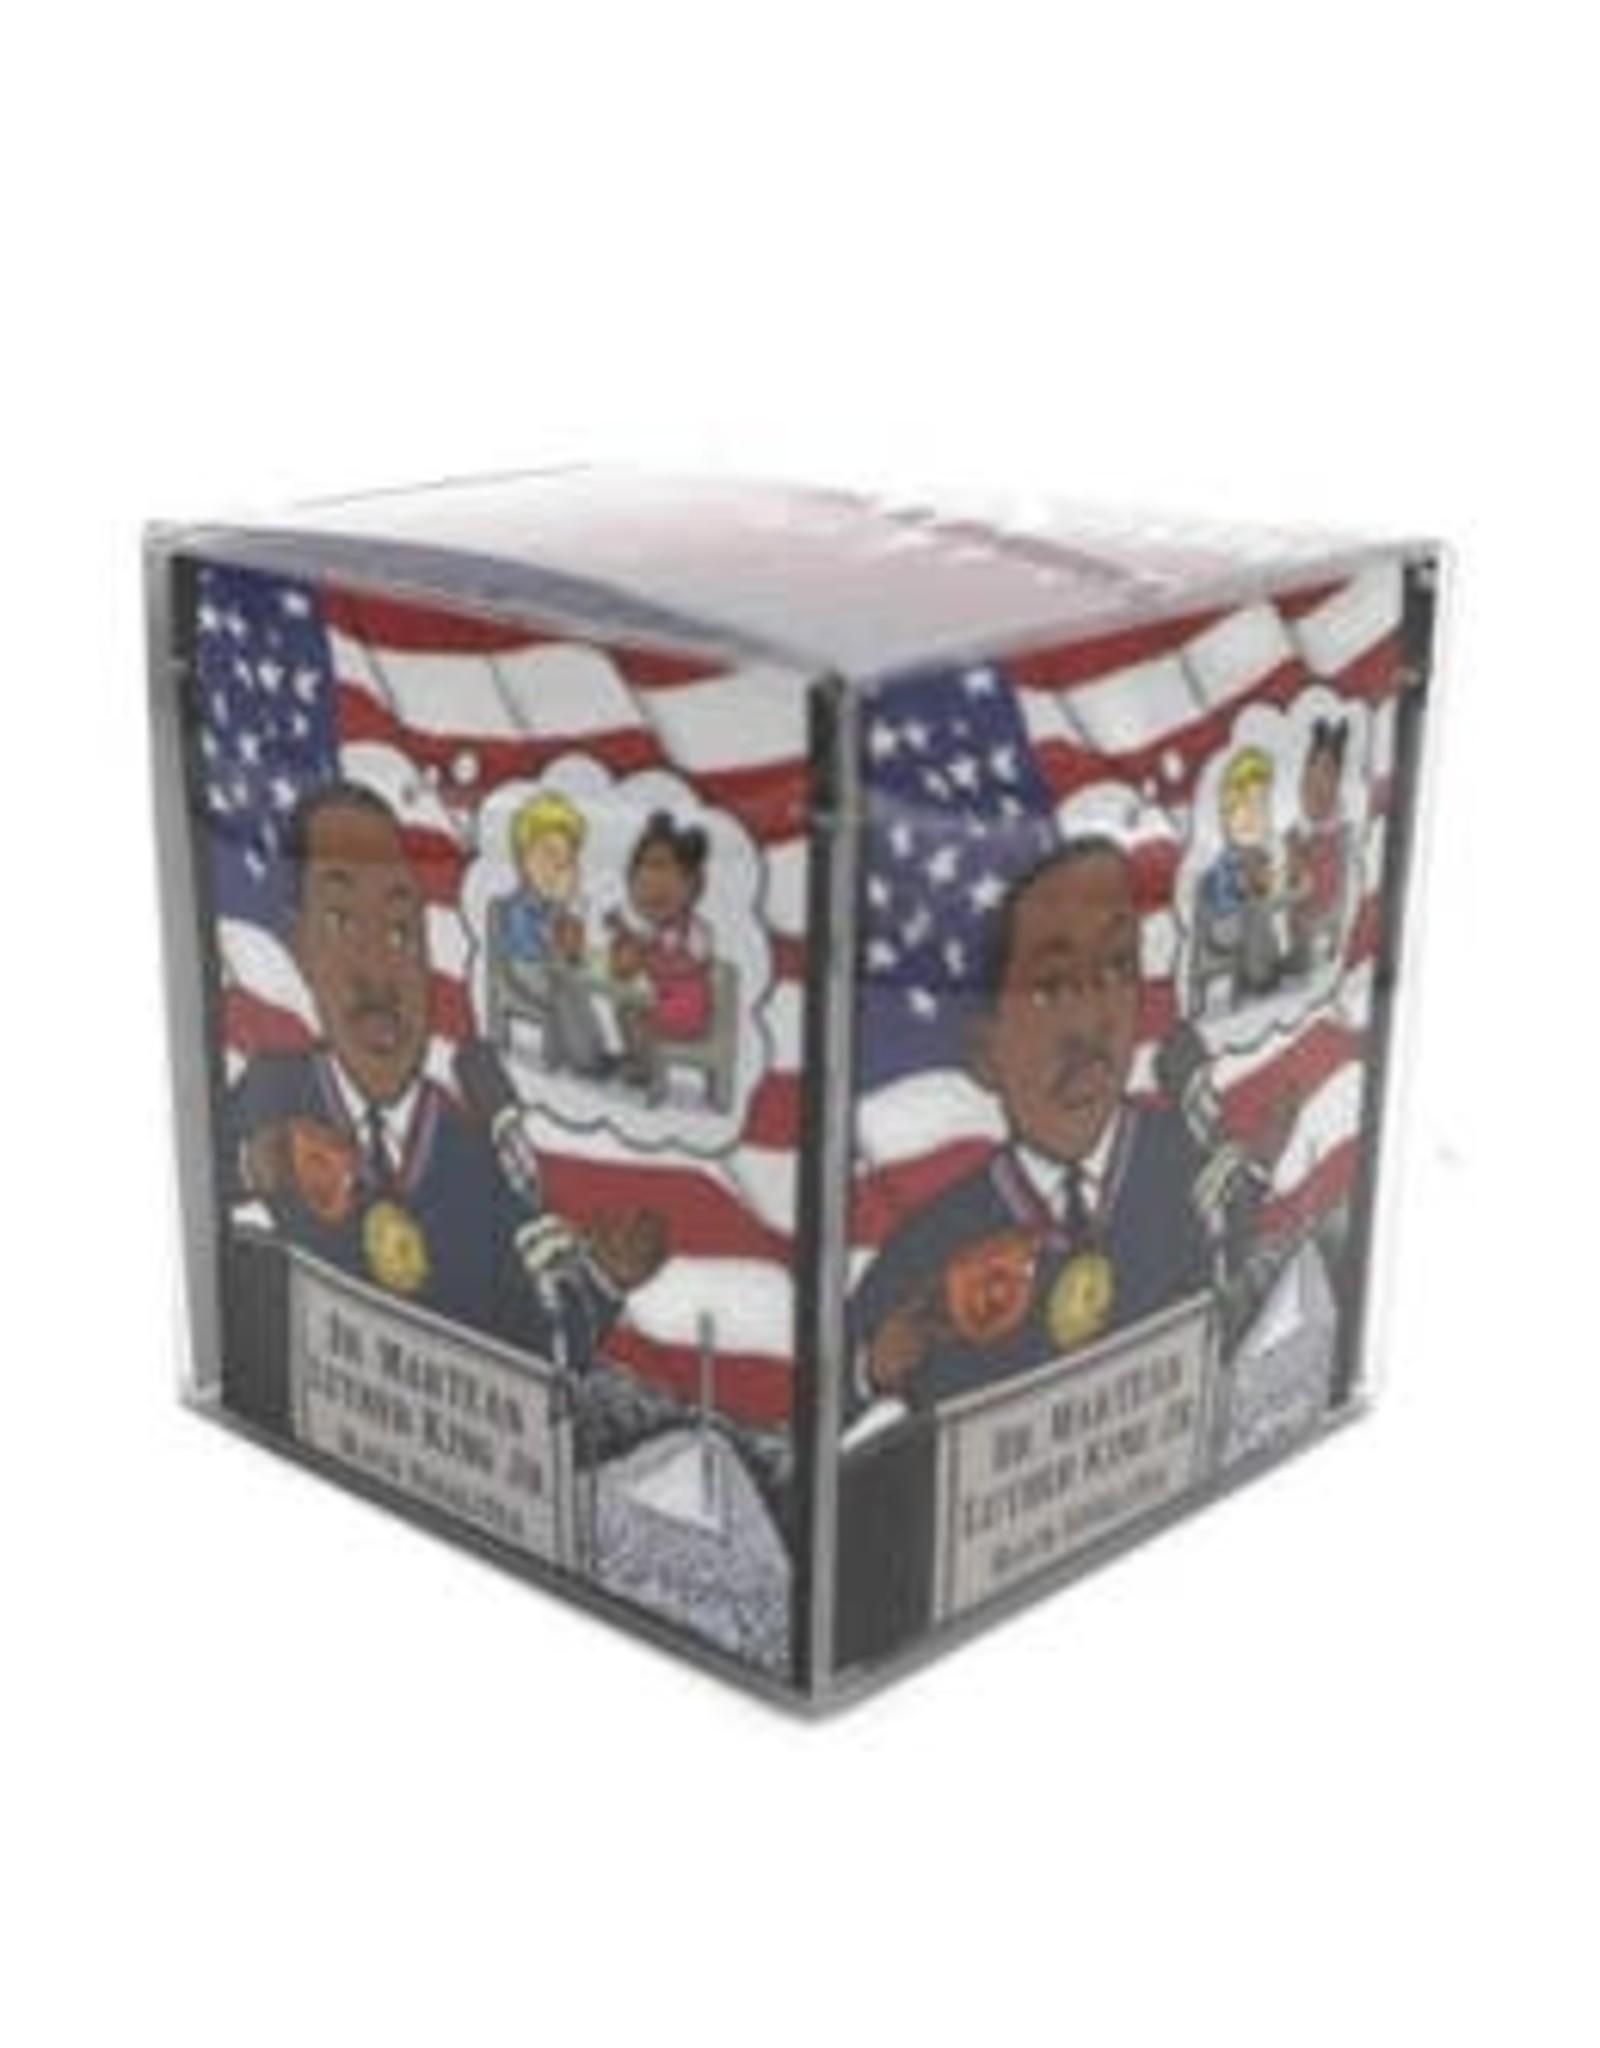 The TeaBook MarTEAn Luther King Jr - Organic English Tea